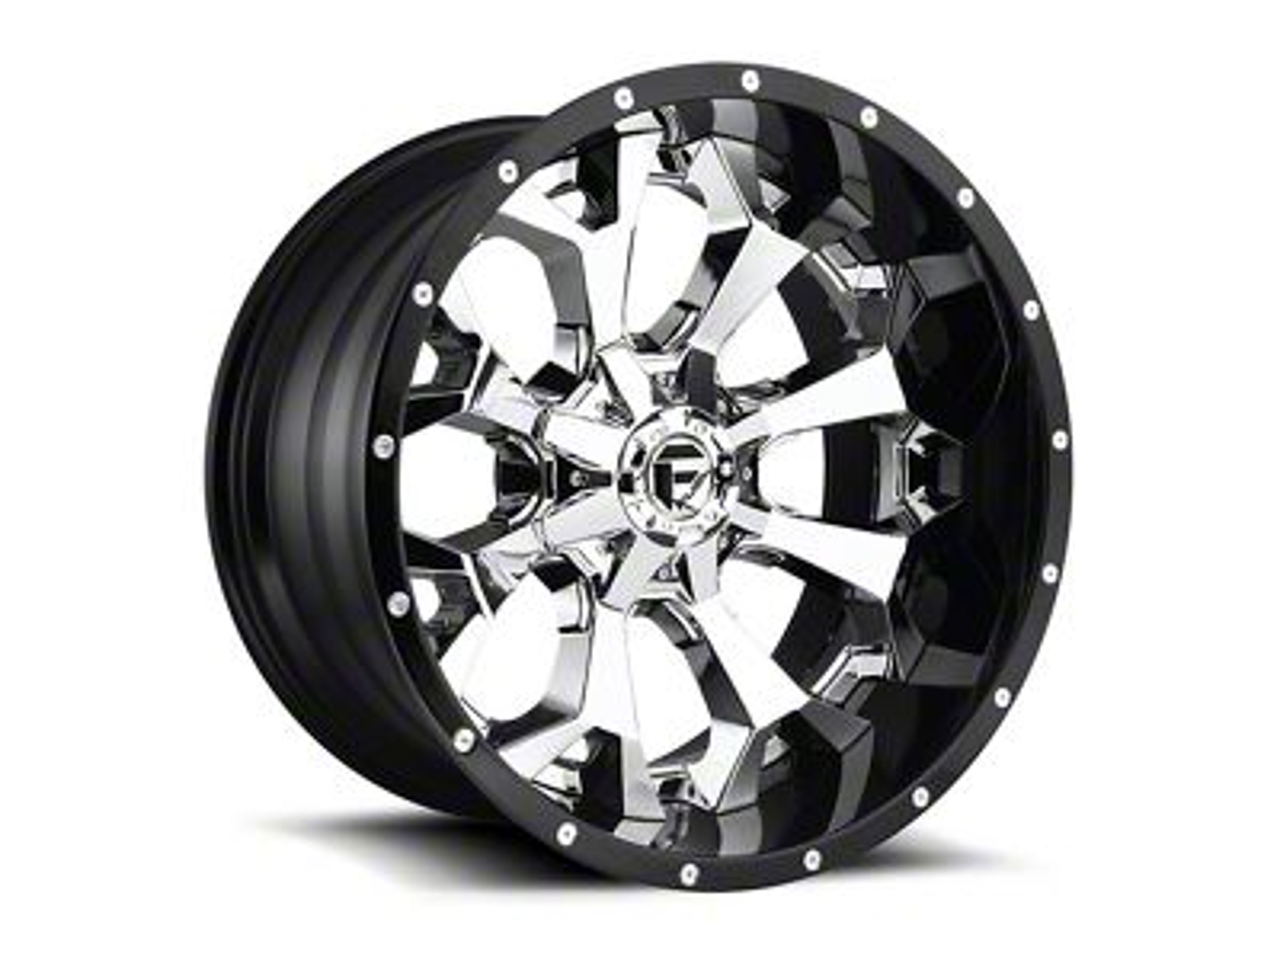 Fuel Wheels Assault Chrome 6-Lug Wheel - 22x10 (07-18 Sierra 1500)